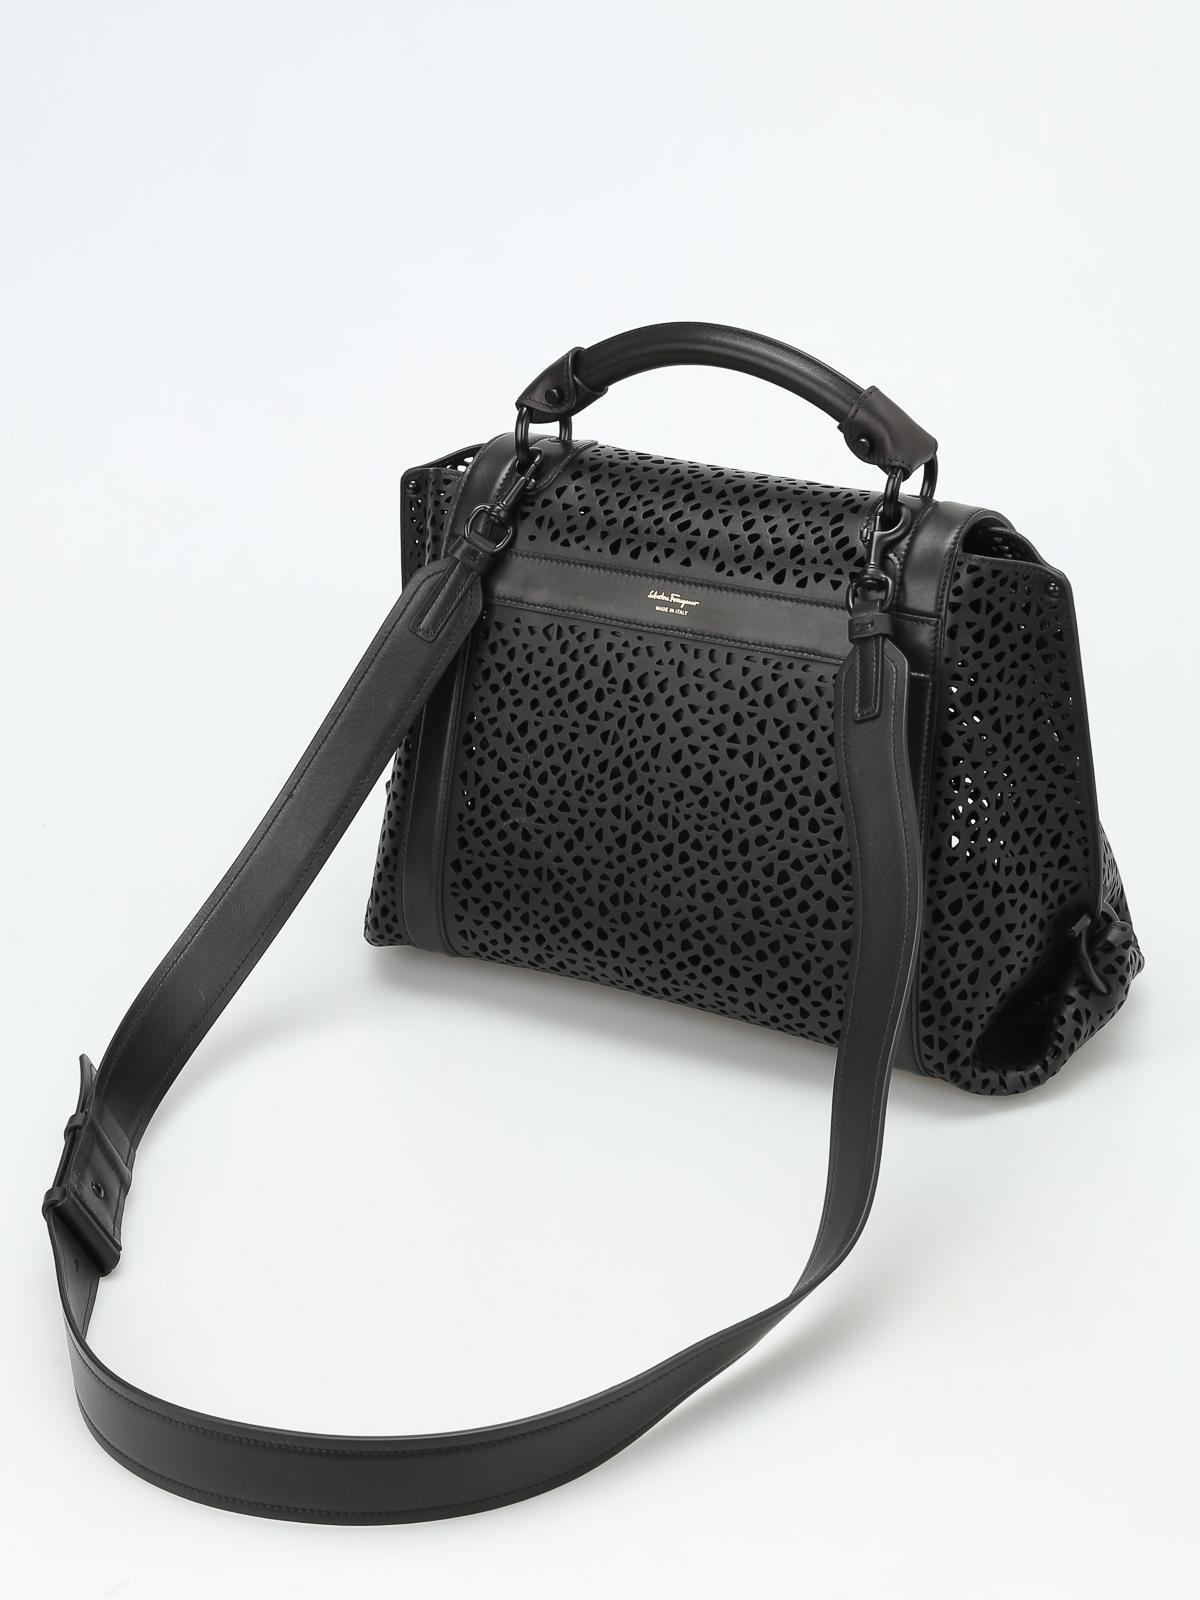 4c6fae631063 ... iKRIX SALVATORE FERRAGAMO bowling bags - Soft Sofia laser cut medium  handbag pick up c4cad 56f1f ...